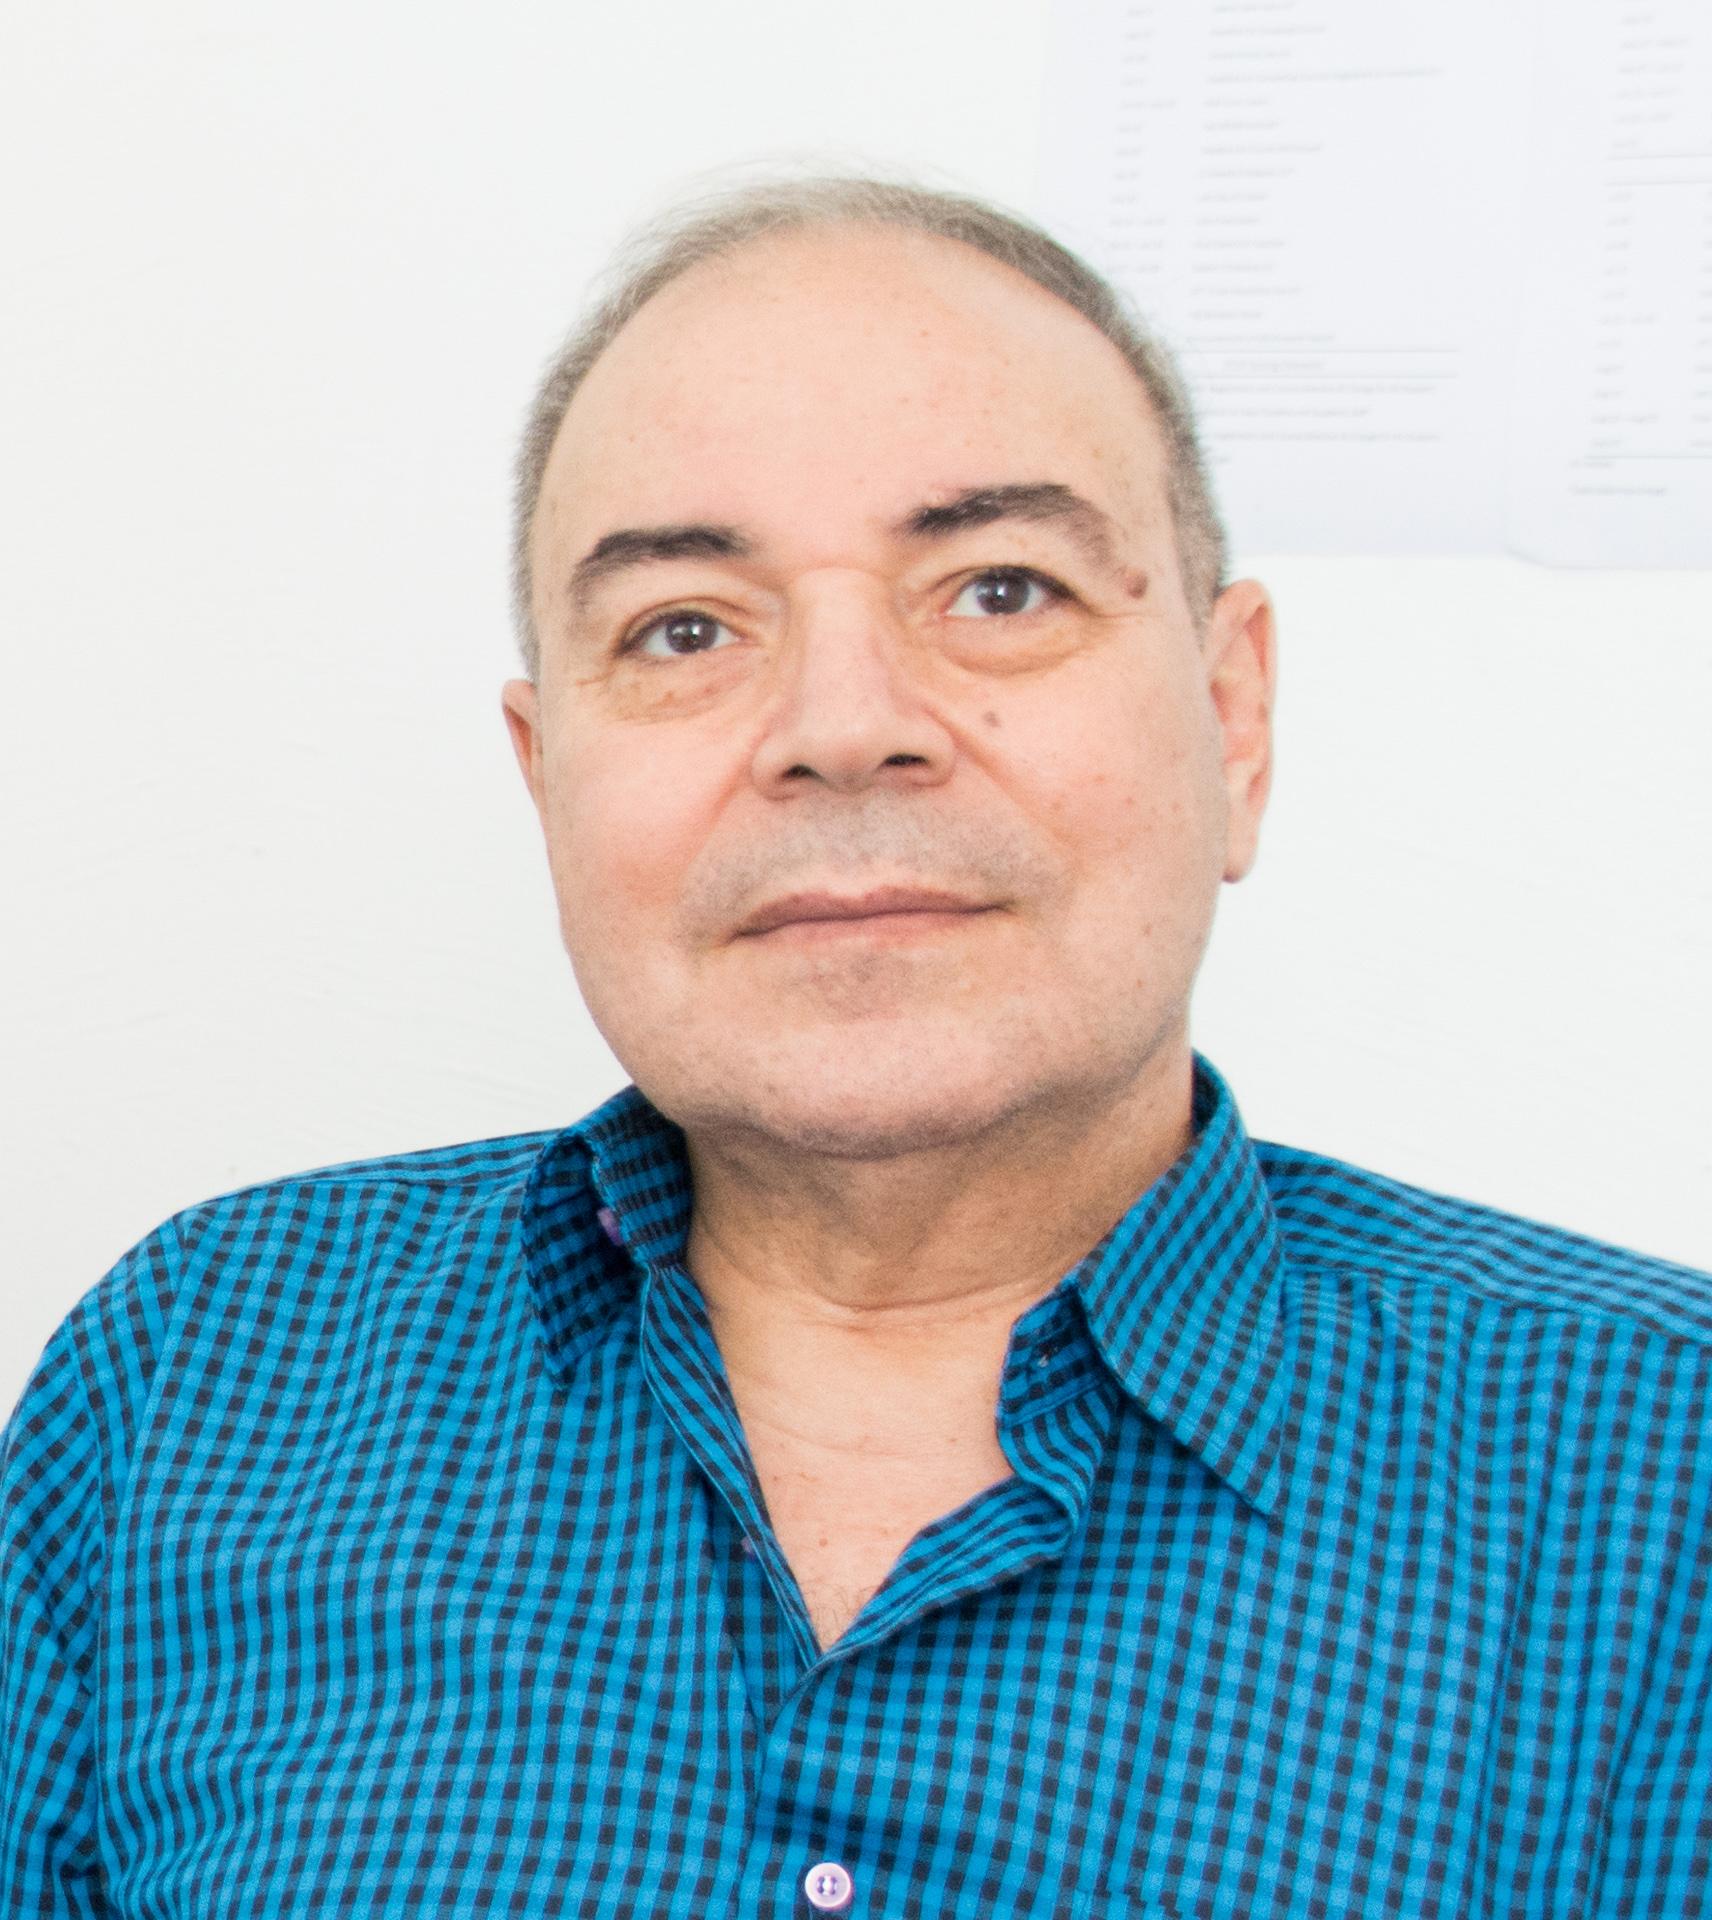 Rezk Hamouda